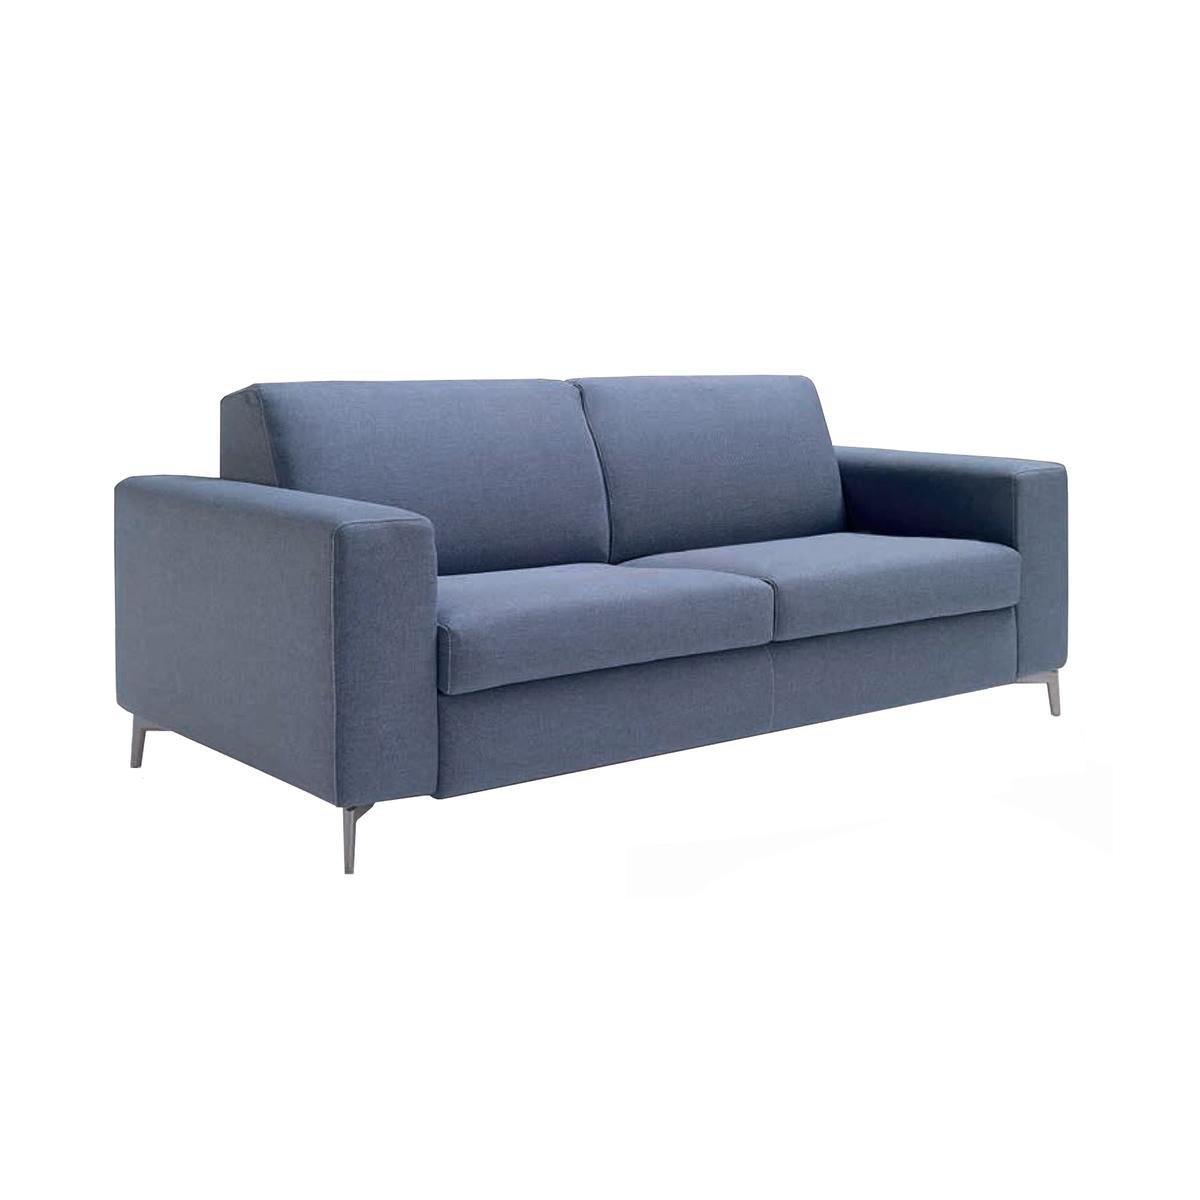 Sof cama moderno mobiliario profesional dise o for Sofa cama diseno moderno